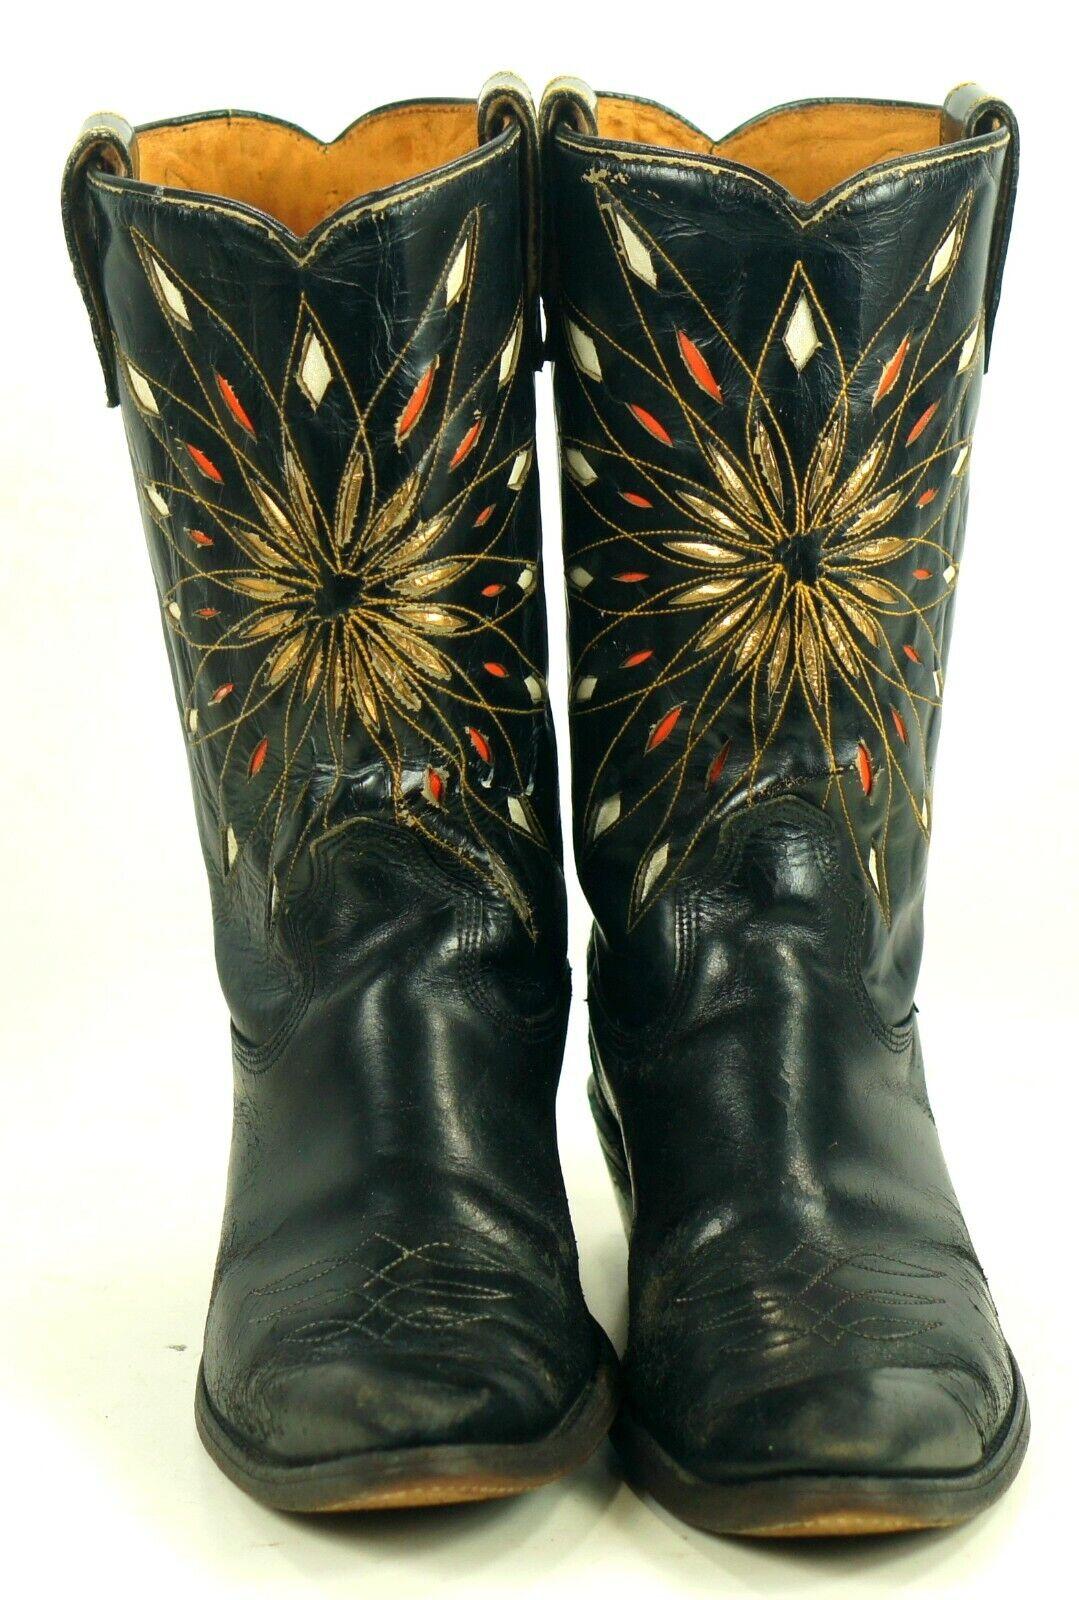 Rare Dodge City Black Cowboy Boots Inlay Gold Sunburst Vintage 50s 60s Men's 8.5